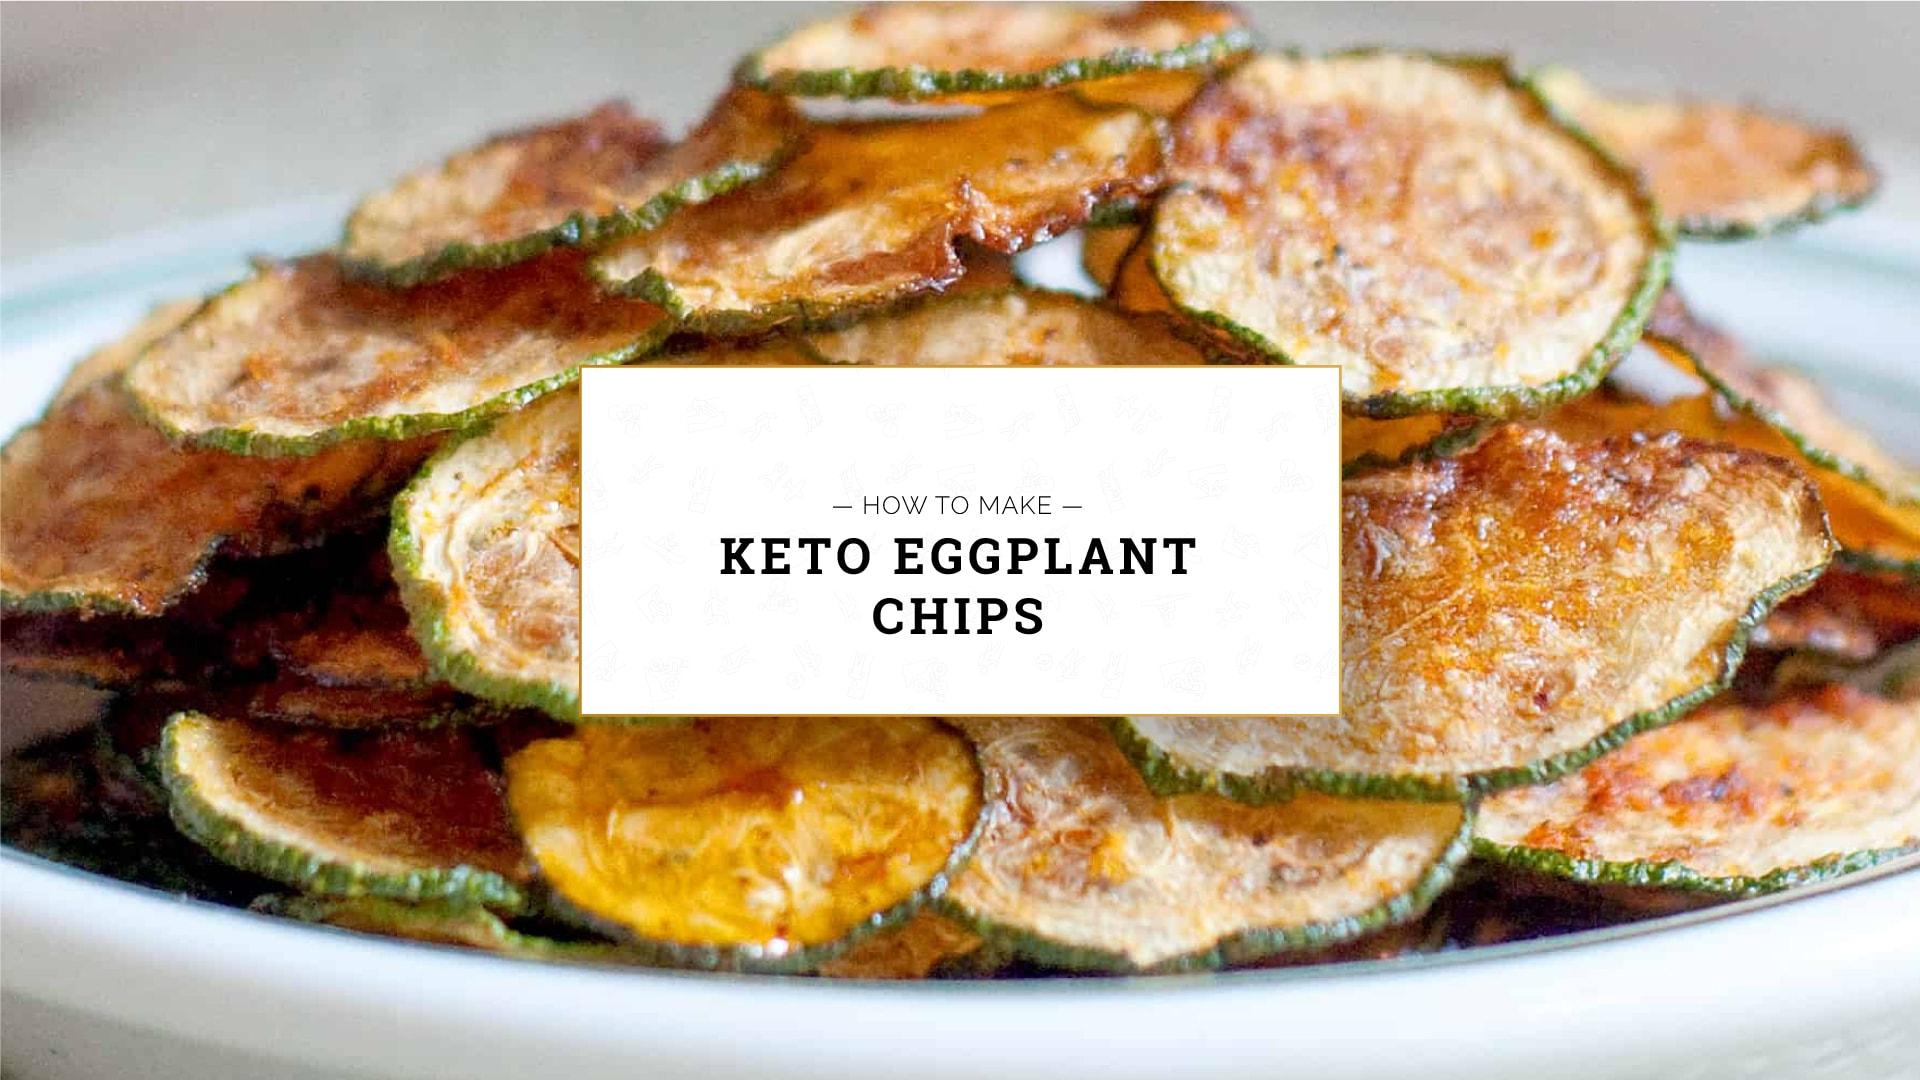 Keto Eggplant Chips